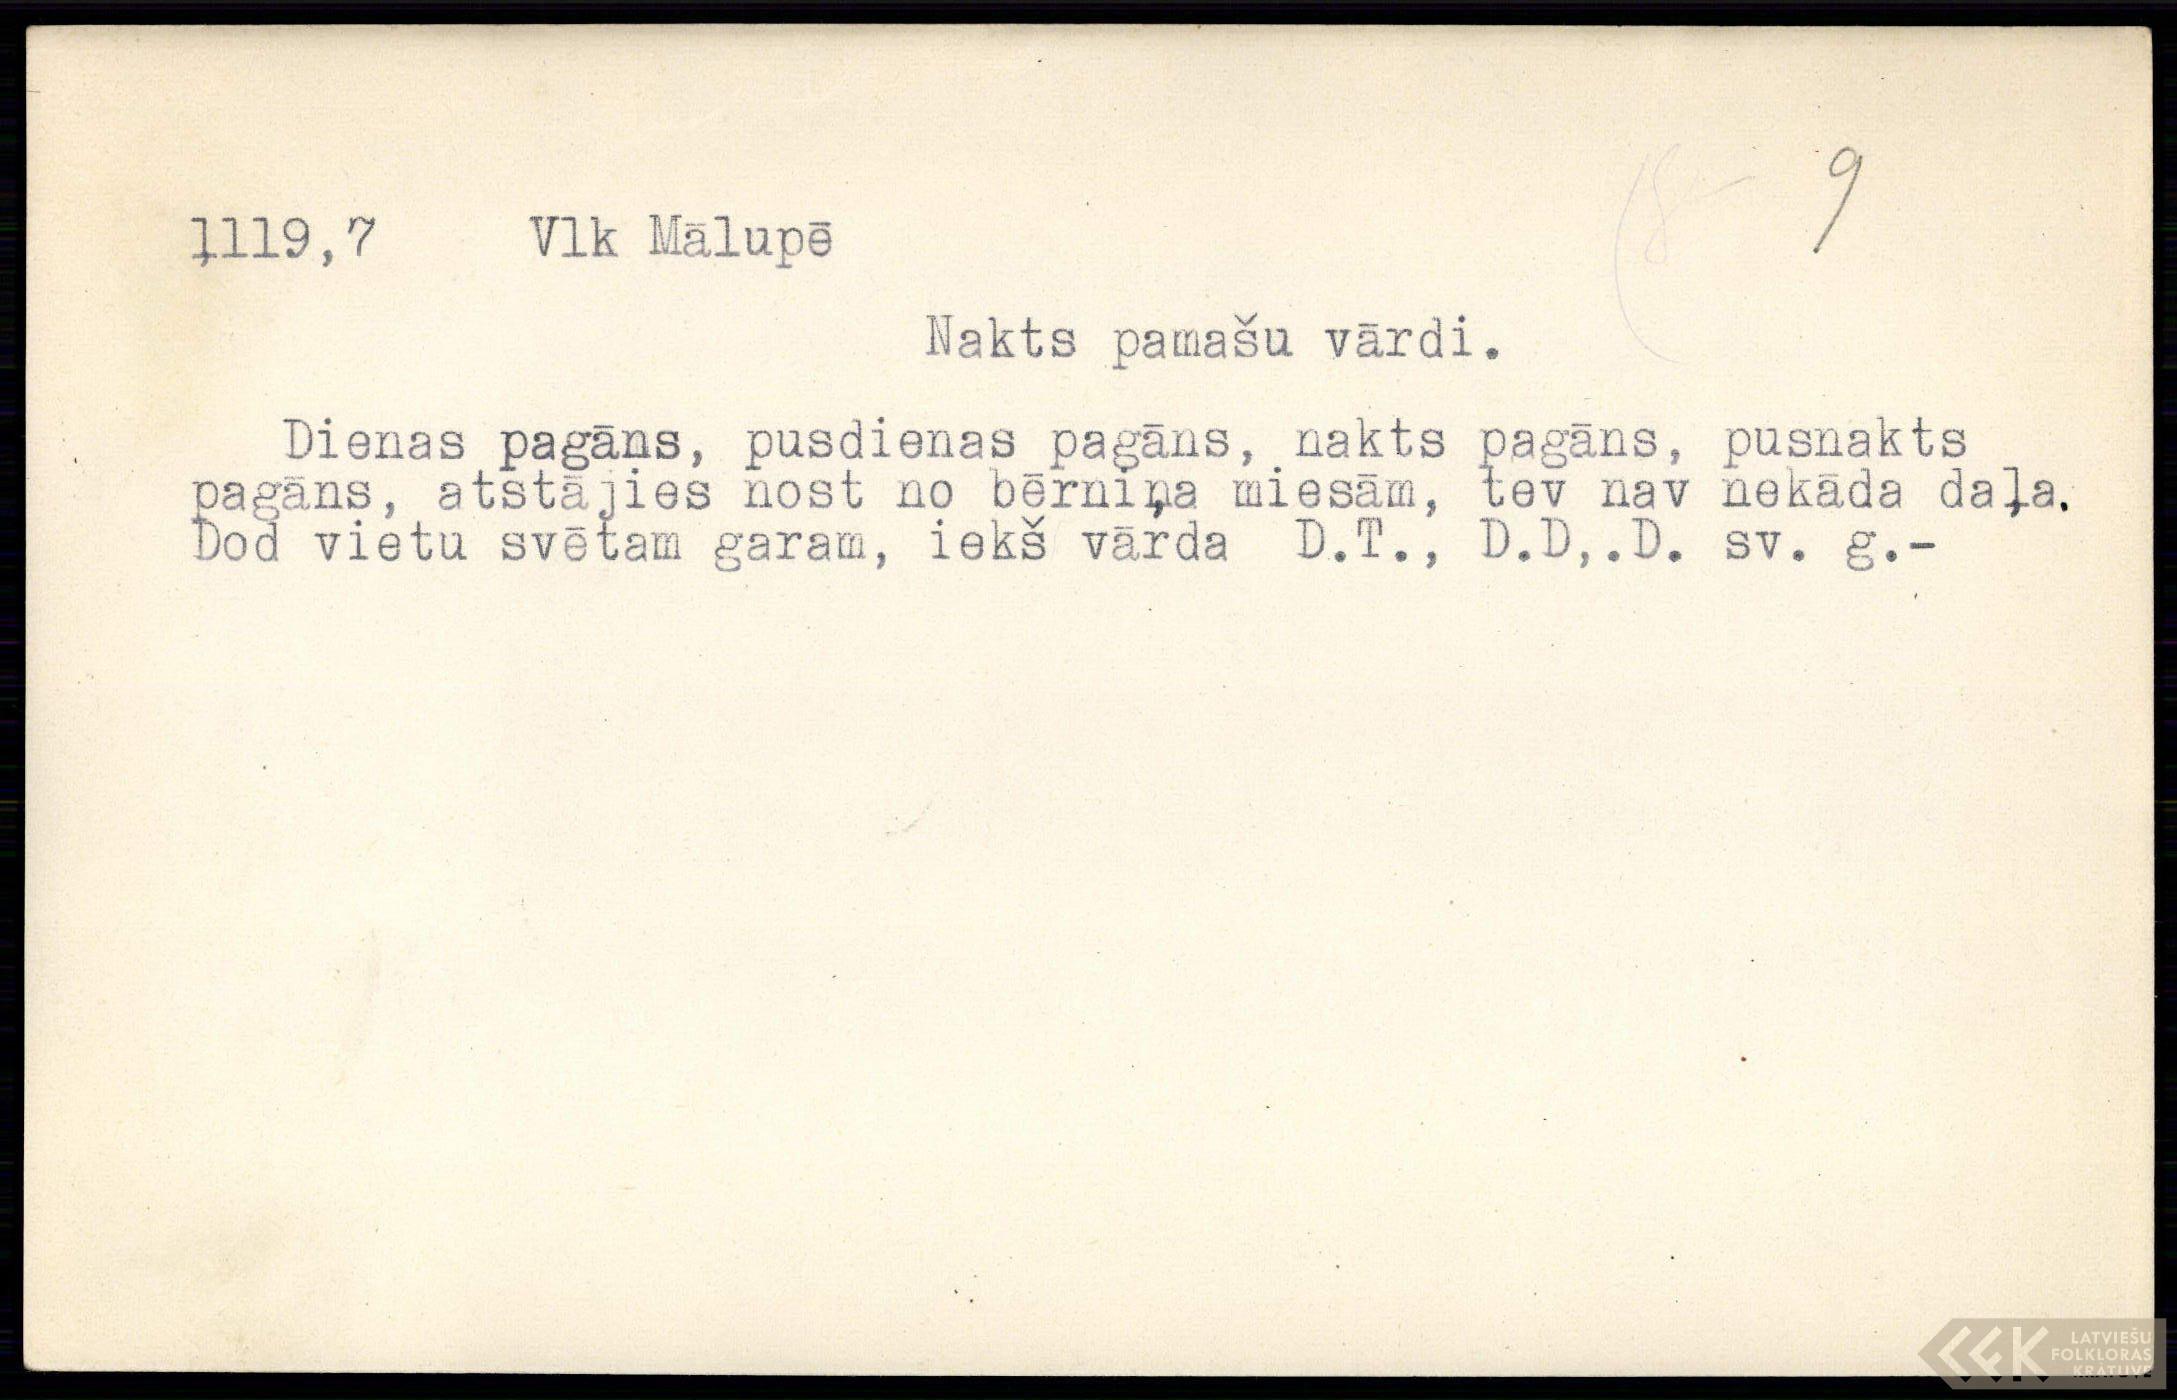 LFK-1119-00007-buramvardu-kartoteka